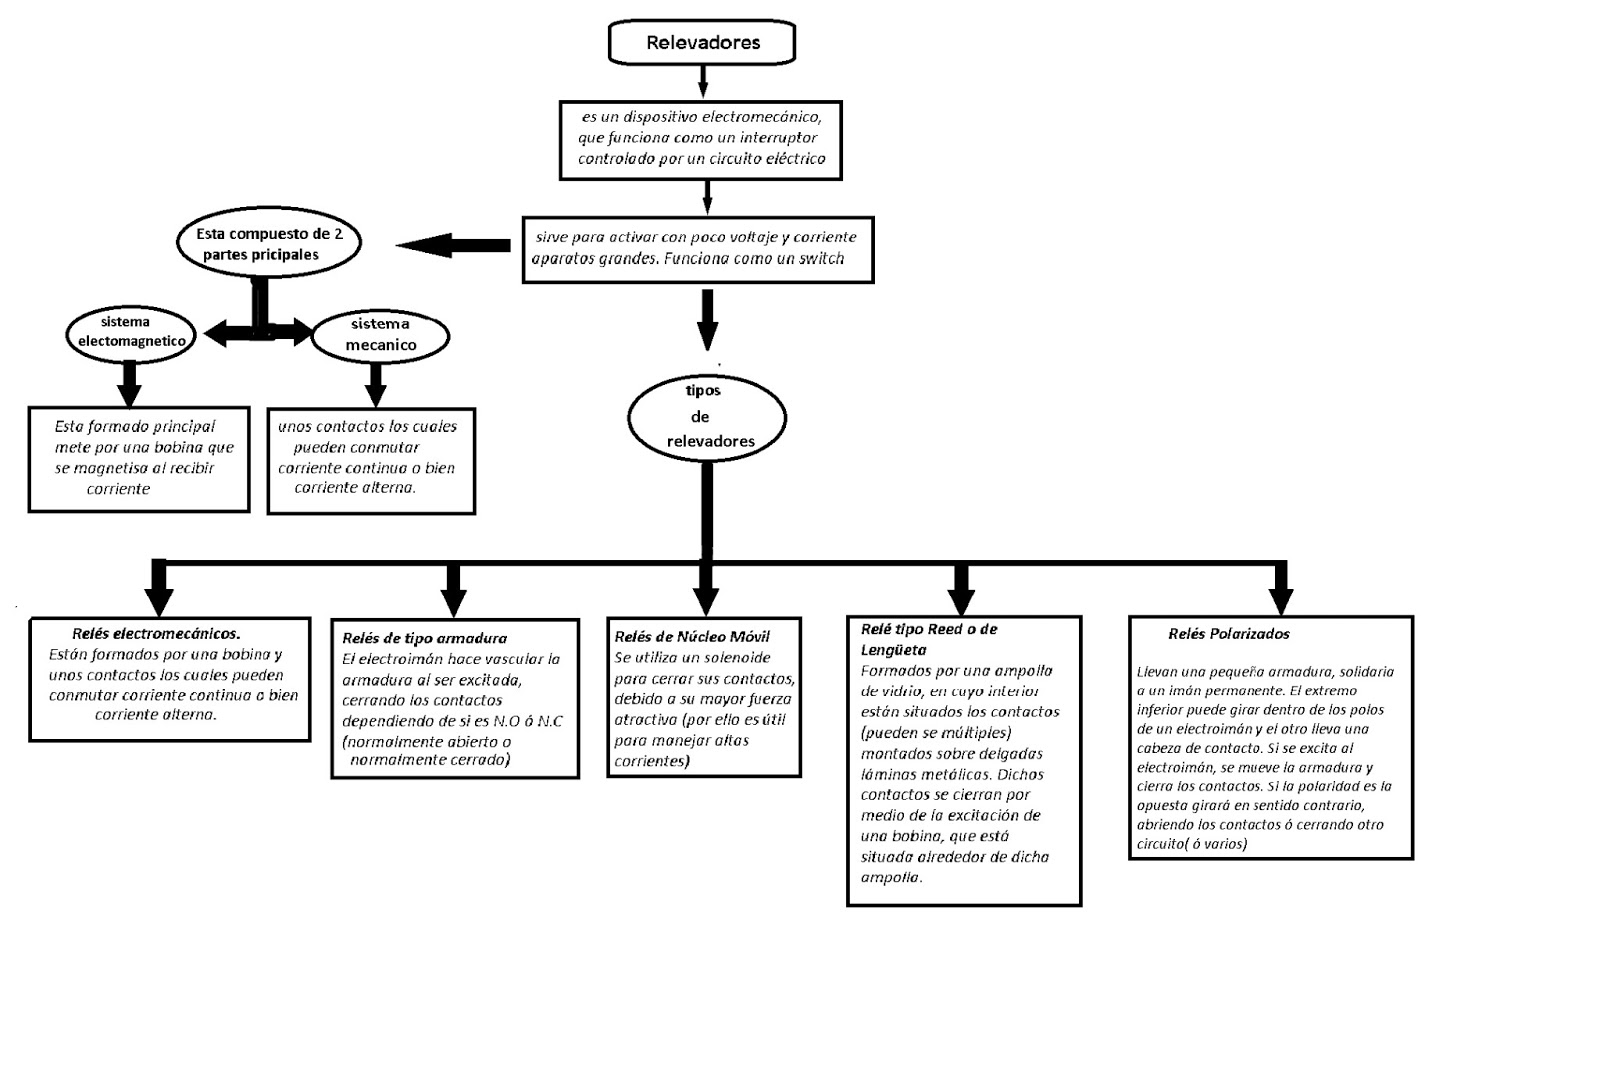 controlado de video juego auto electrical wiring diagram version namesingleledschematicjpg views12 size106 kb id837 [ 1600 x 1092 Pixel ]